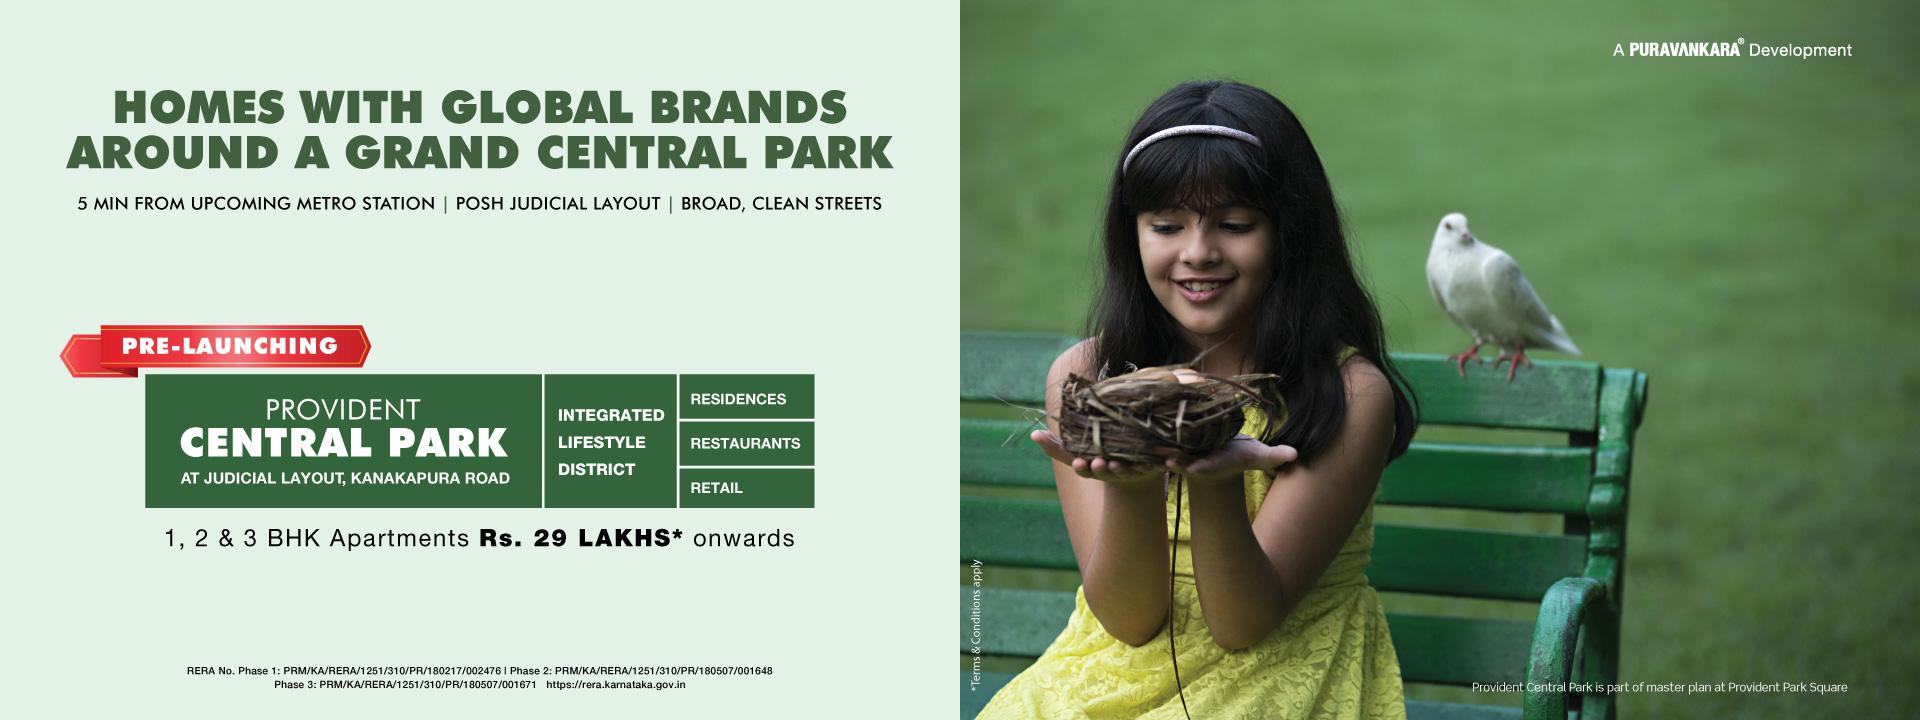 Provident-Central-Park